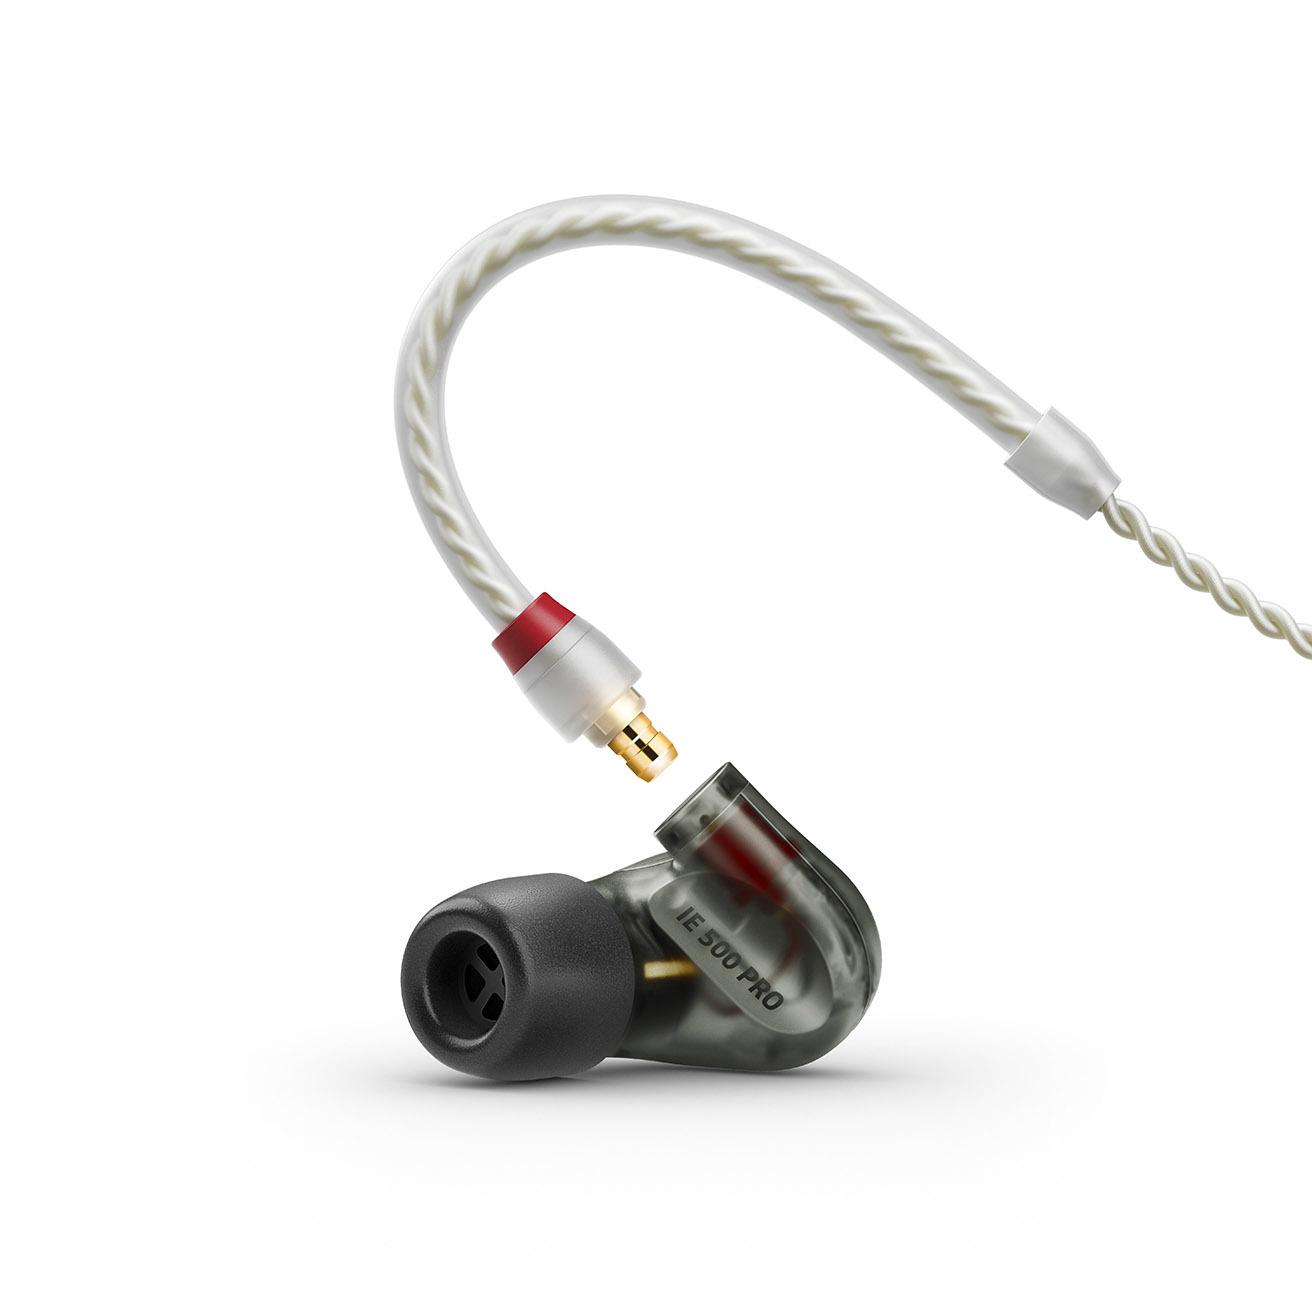 Sennheiser IE 500 Pro